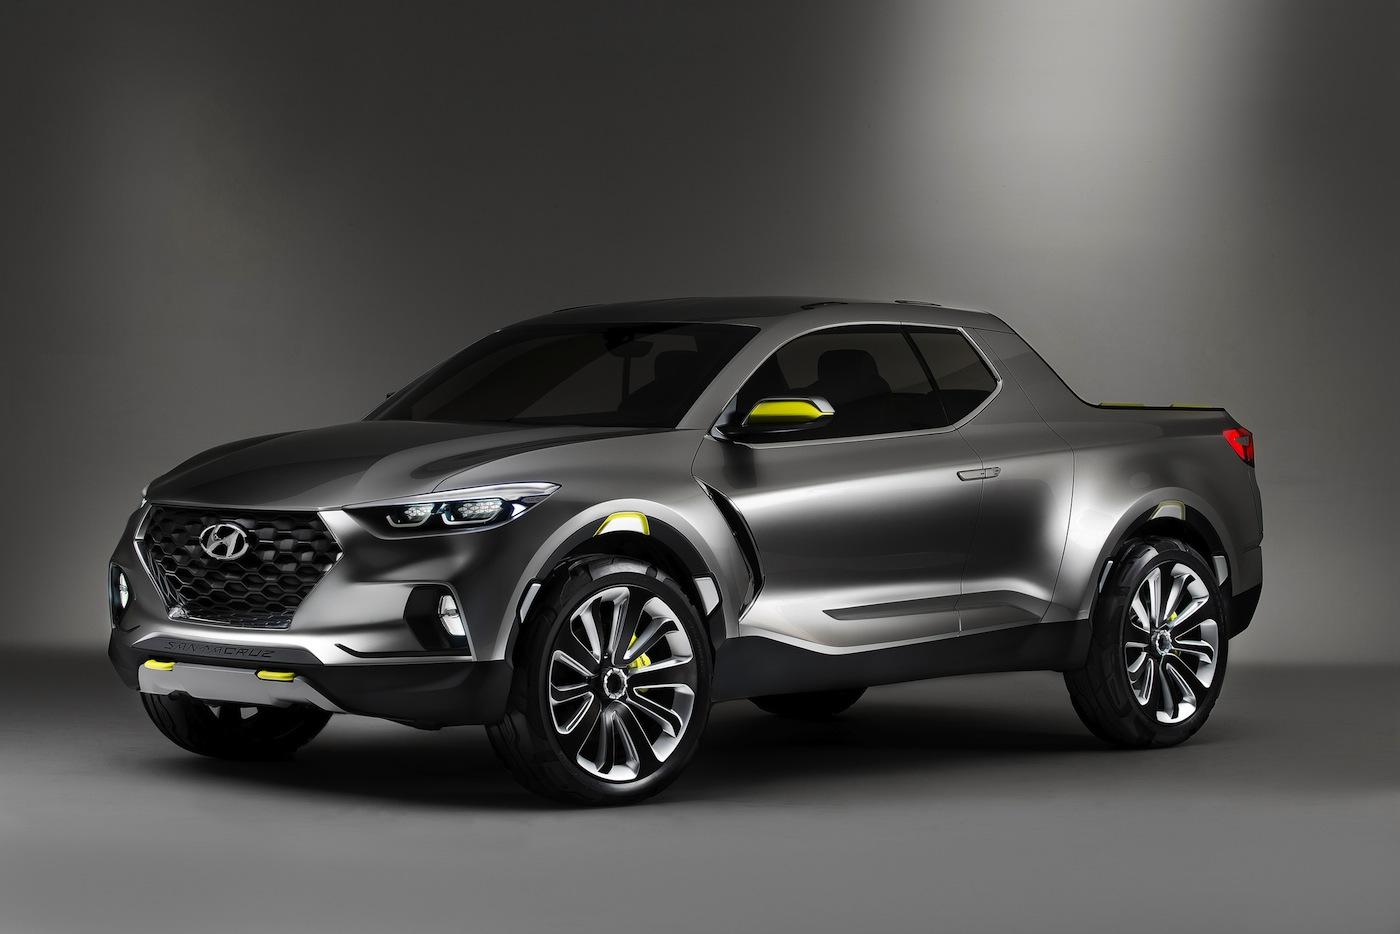 Hyundai Santa Cruz Crossover Truck Concept 2015 01